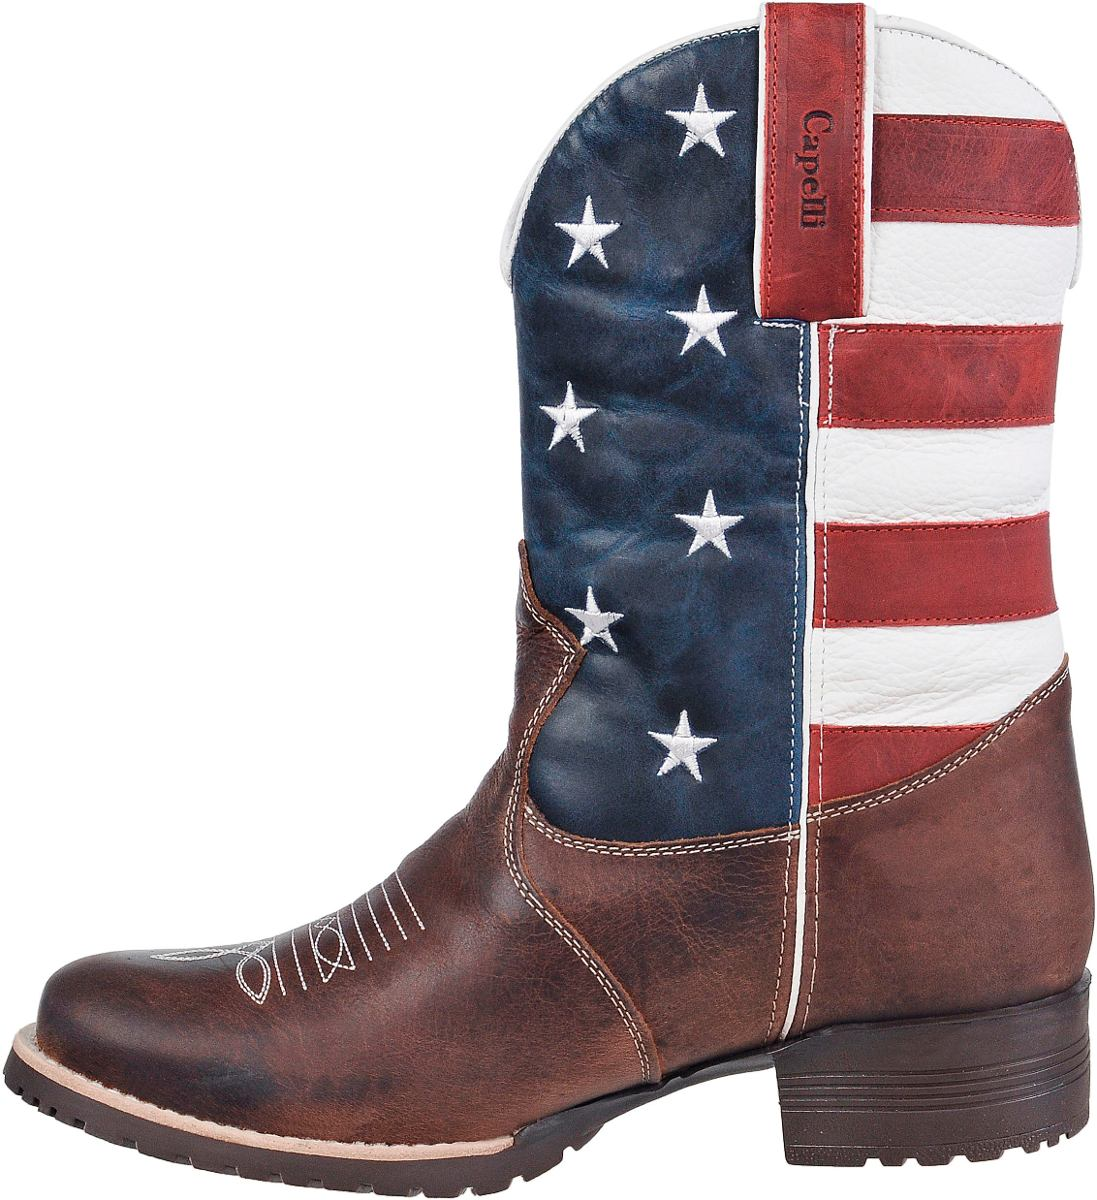 3d31ccc0ab Bota Texana Eua Country Western Couro Legitimo Capelli Boots - R ...